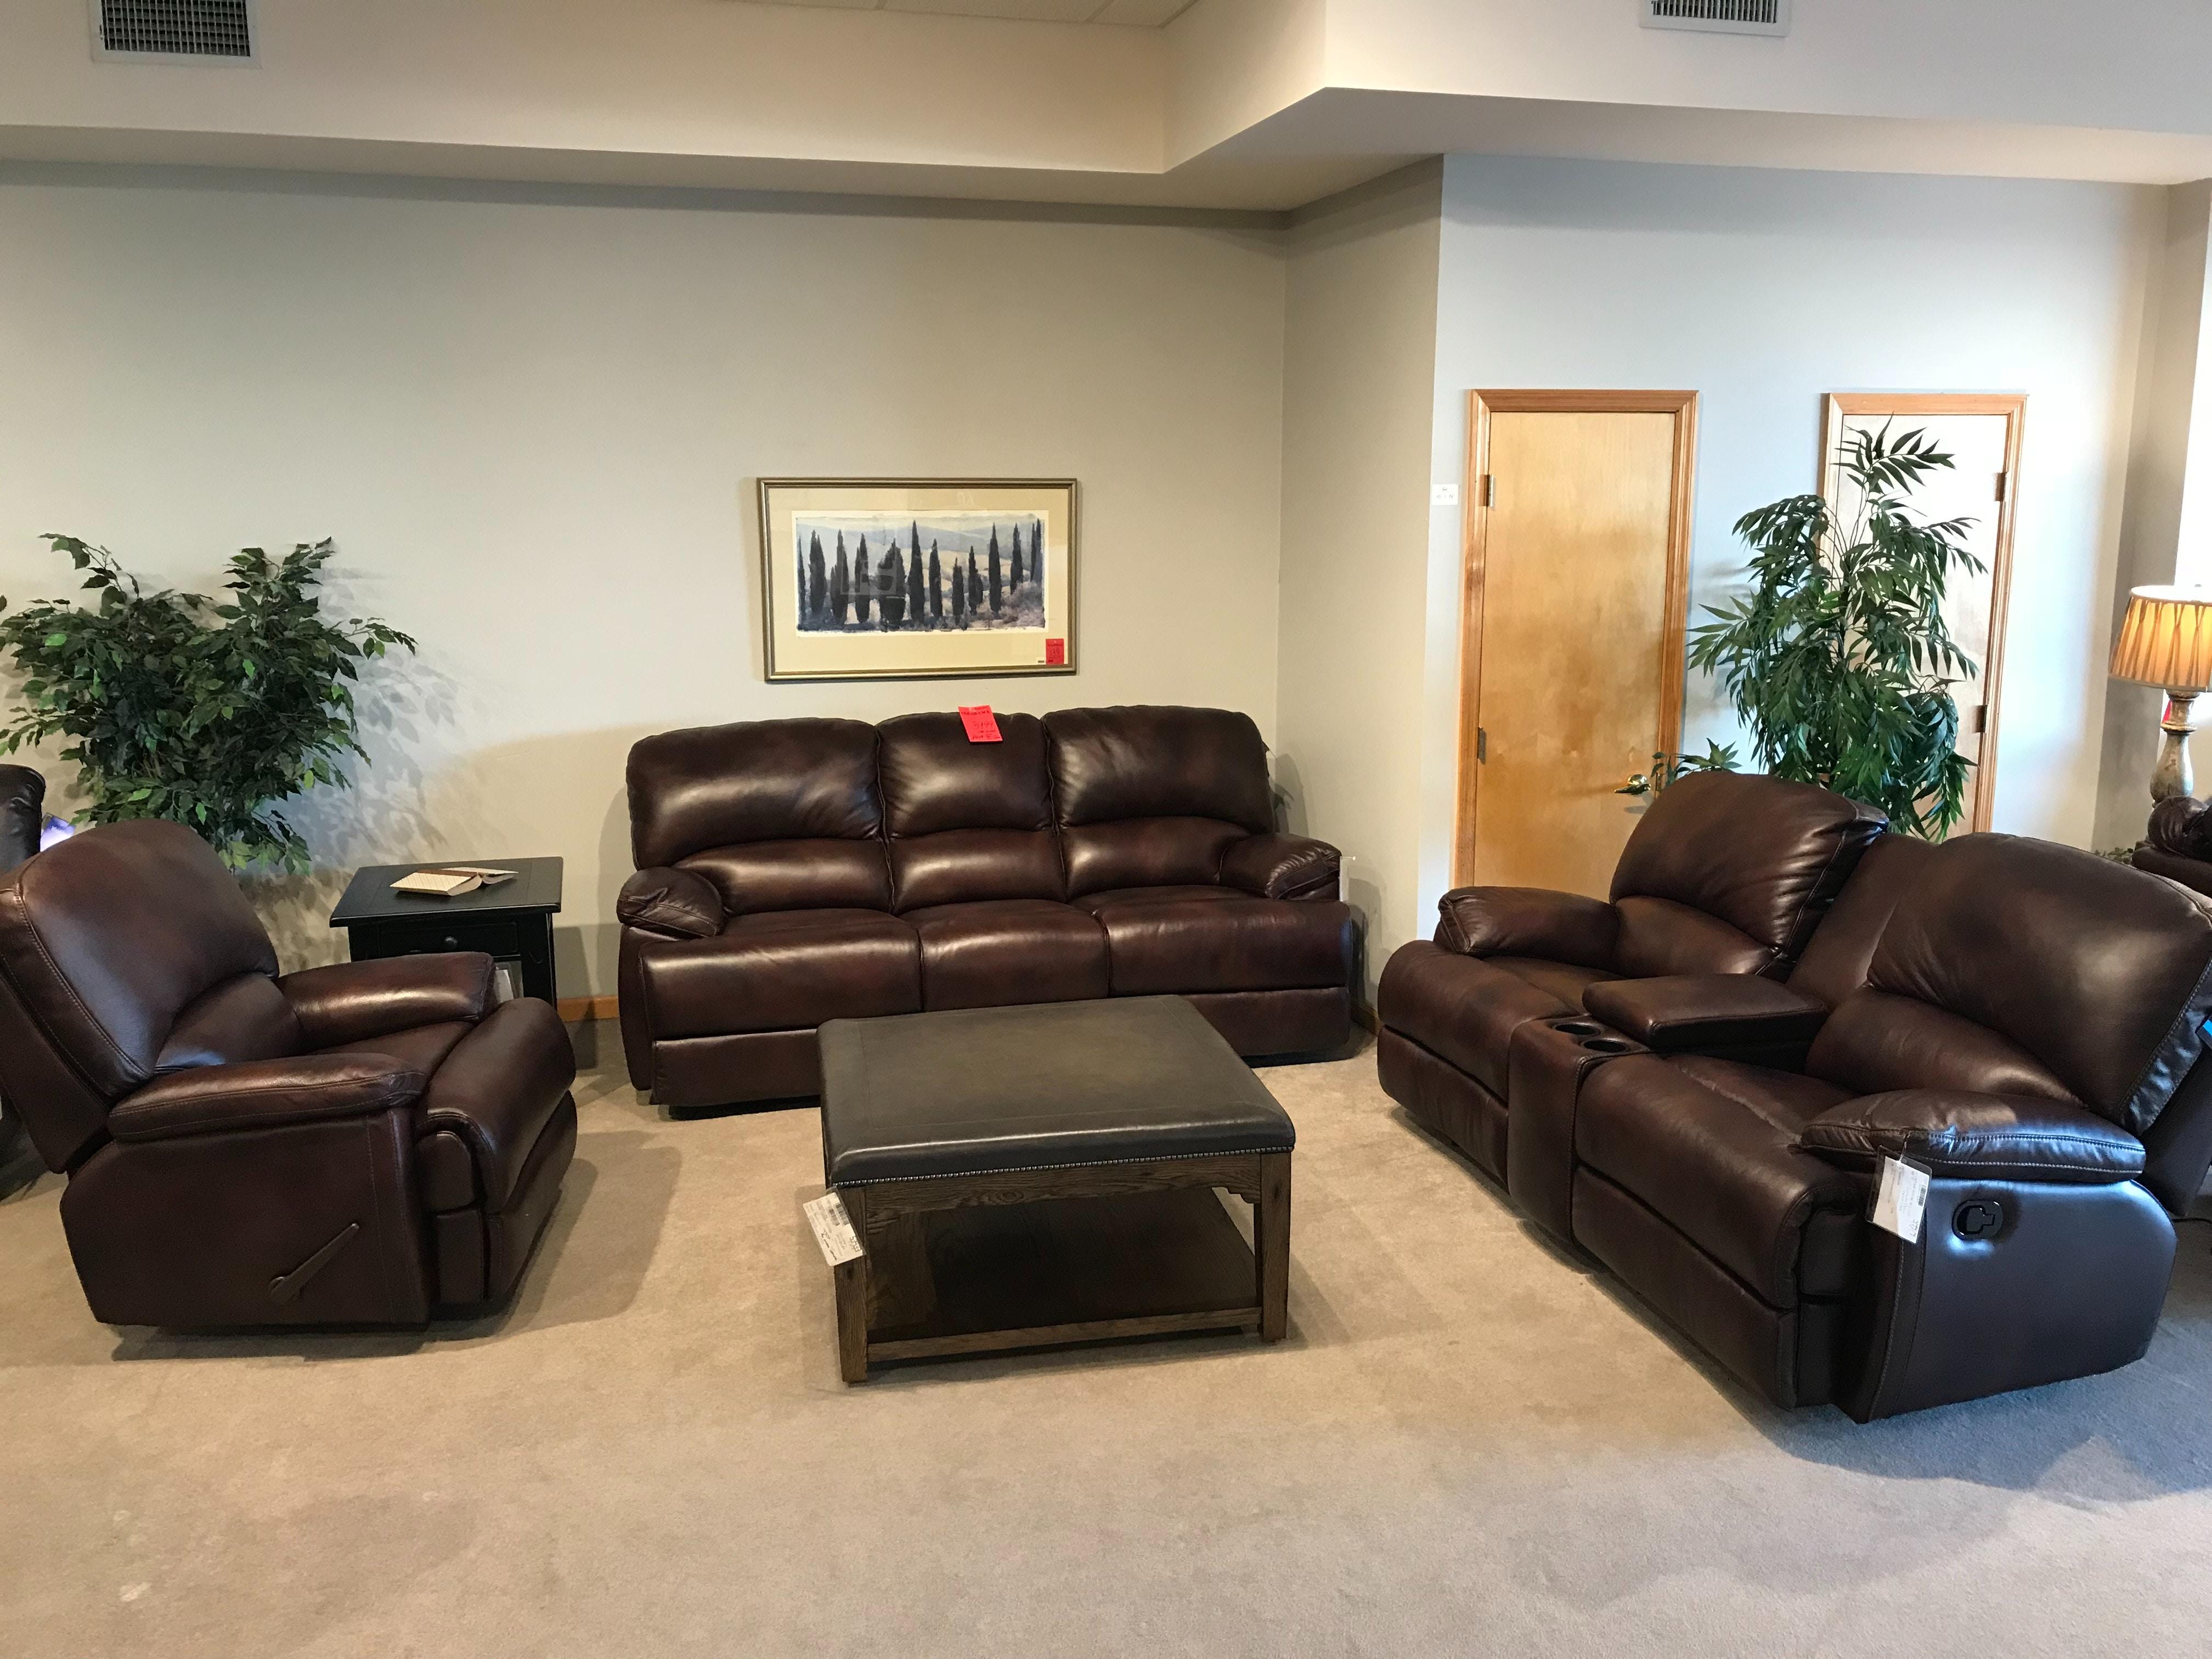 nice living room sets extension cord good s clearance furniture kewanee il flexsteel 3pc set